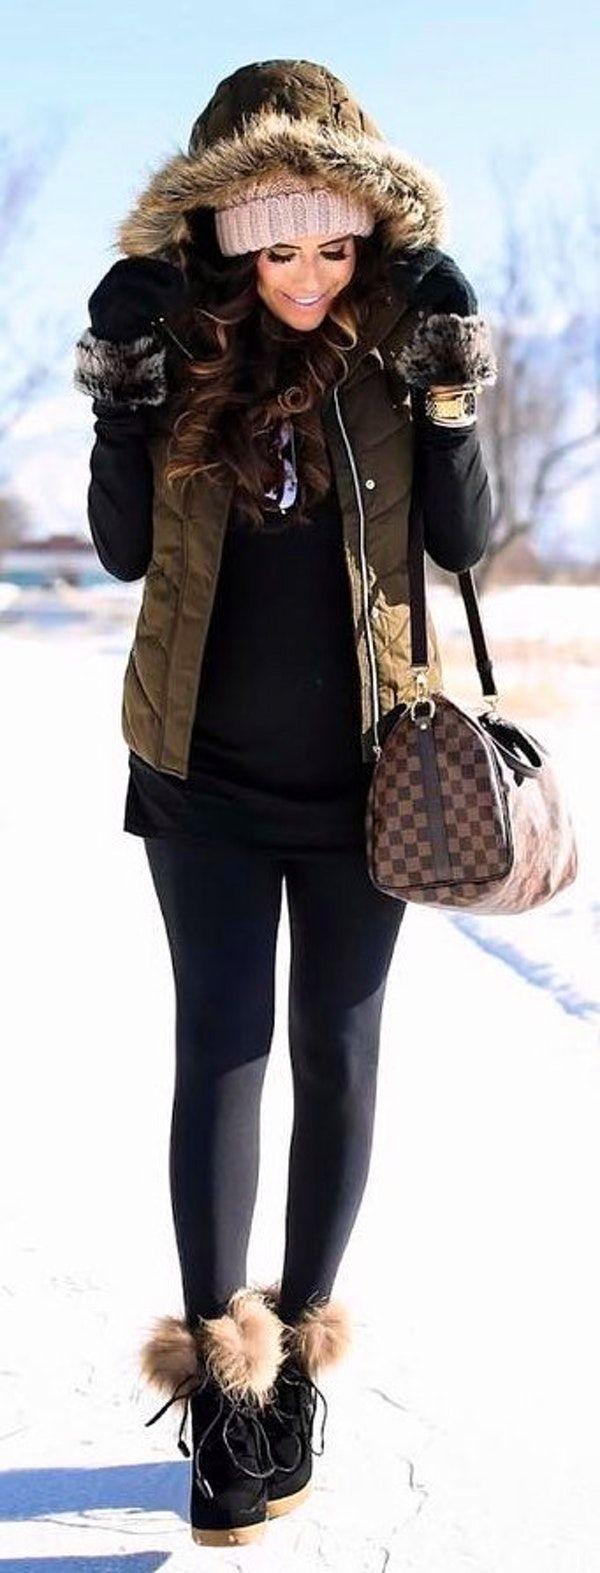 #winter #fashion / Army Vest / Black Top / Black Leggings / Black Snow Boots